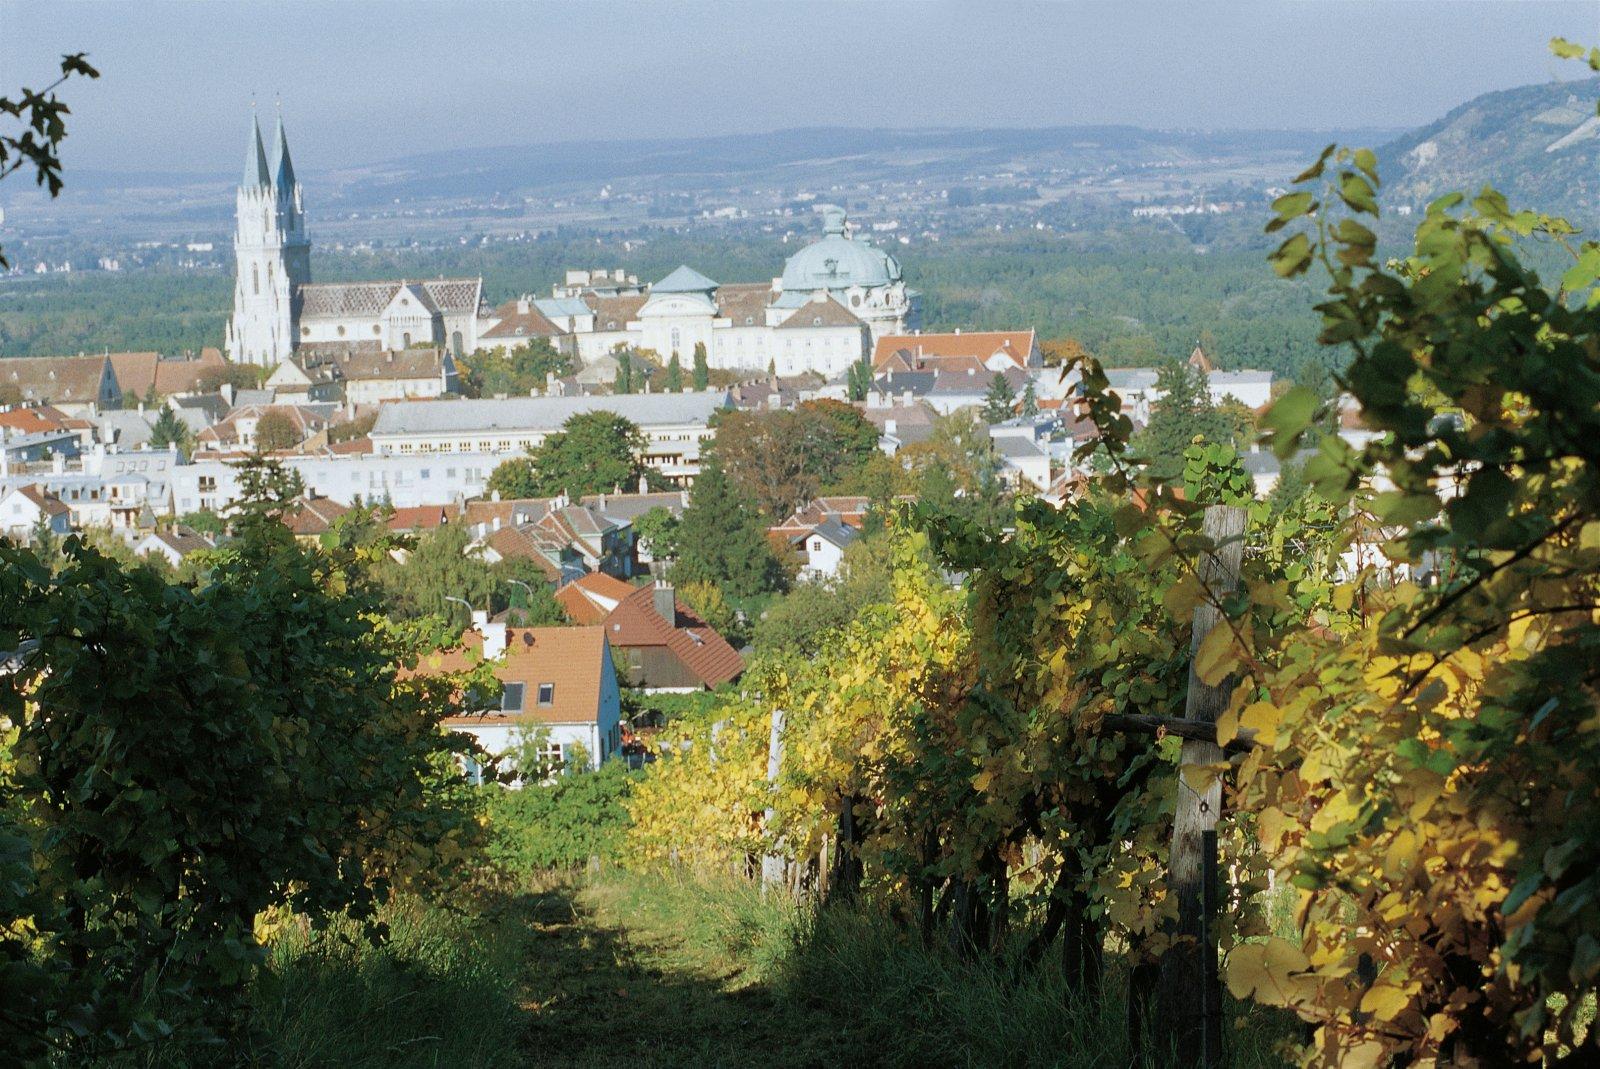 Монастырь Клостернойбург — старейшая школа виноделия